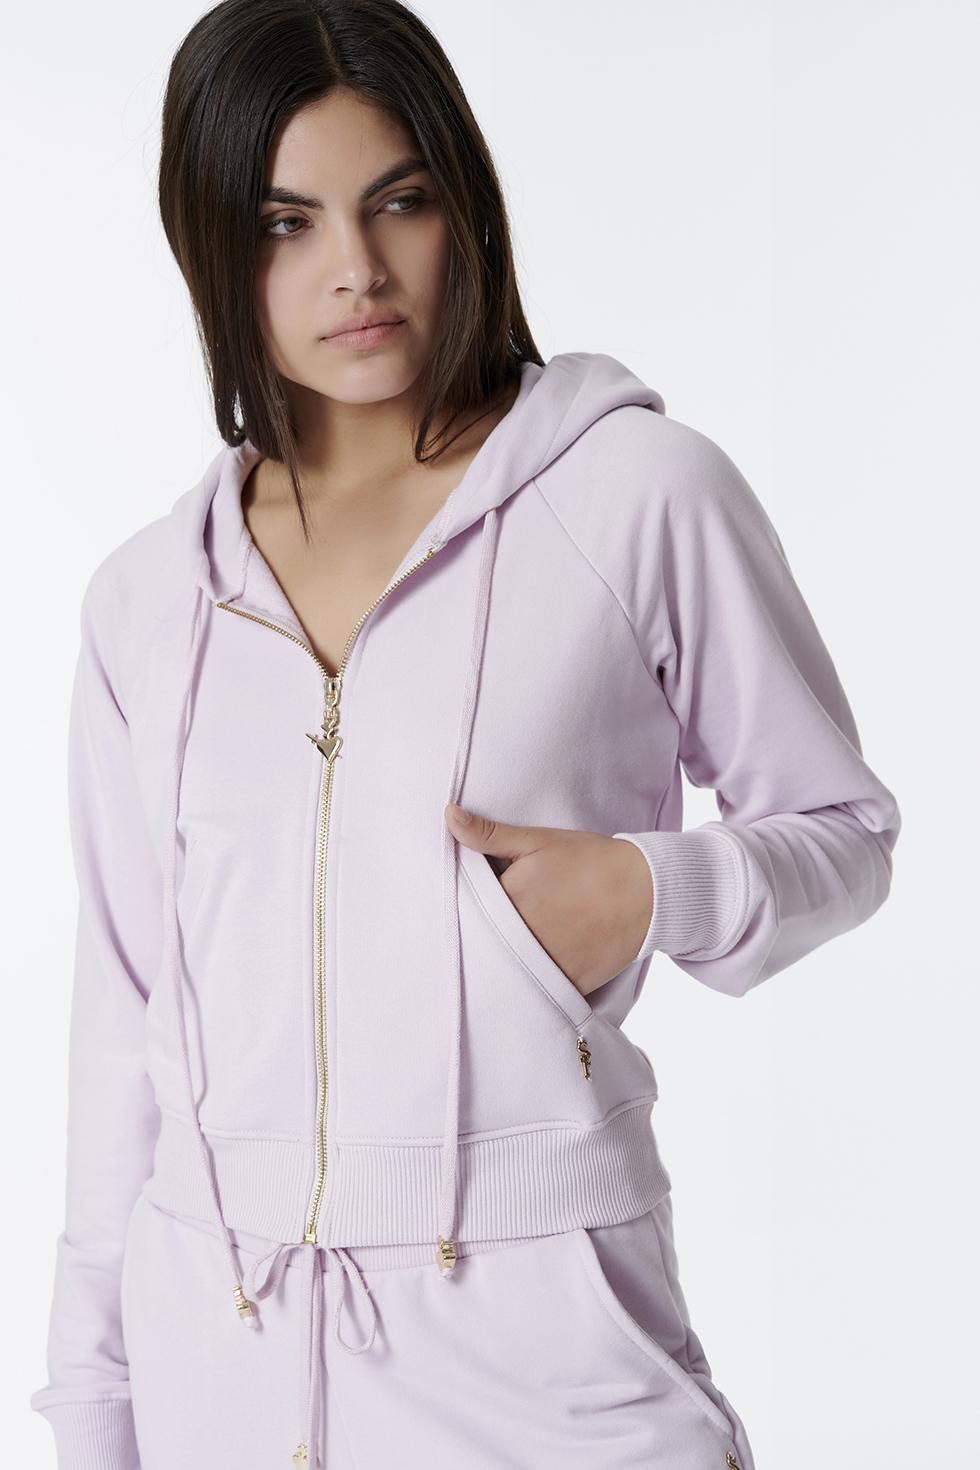 3764691583e Γυναικείες Αθλητικές Φόρμες χρώματος ΡΟΖ | Outfit.gr